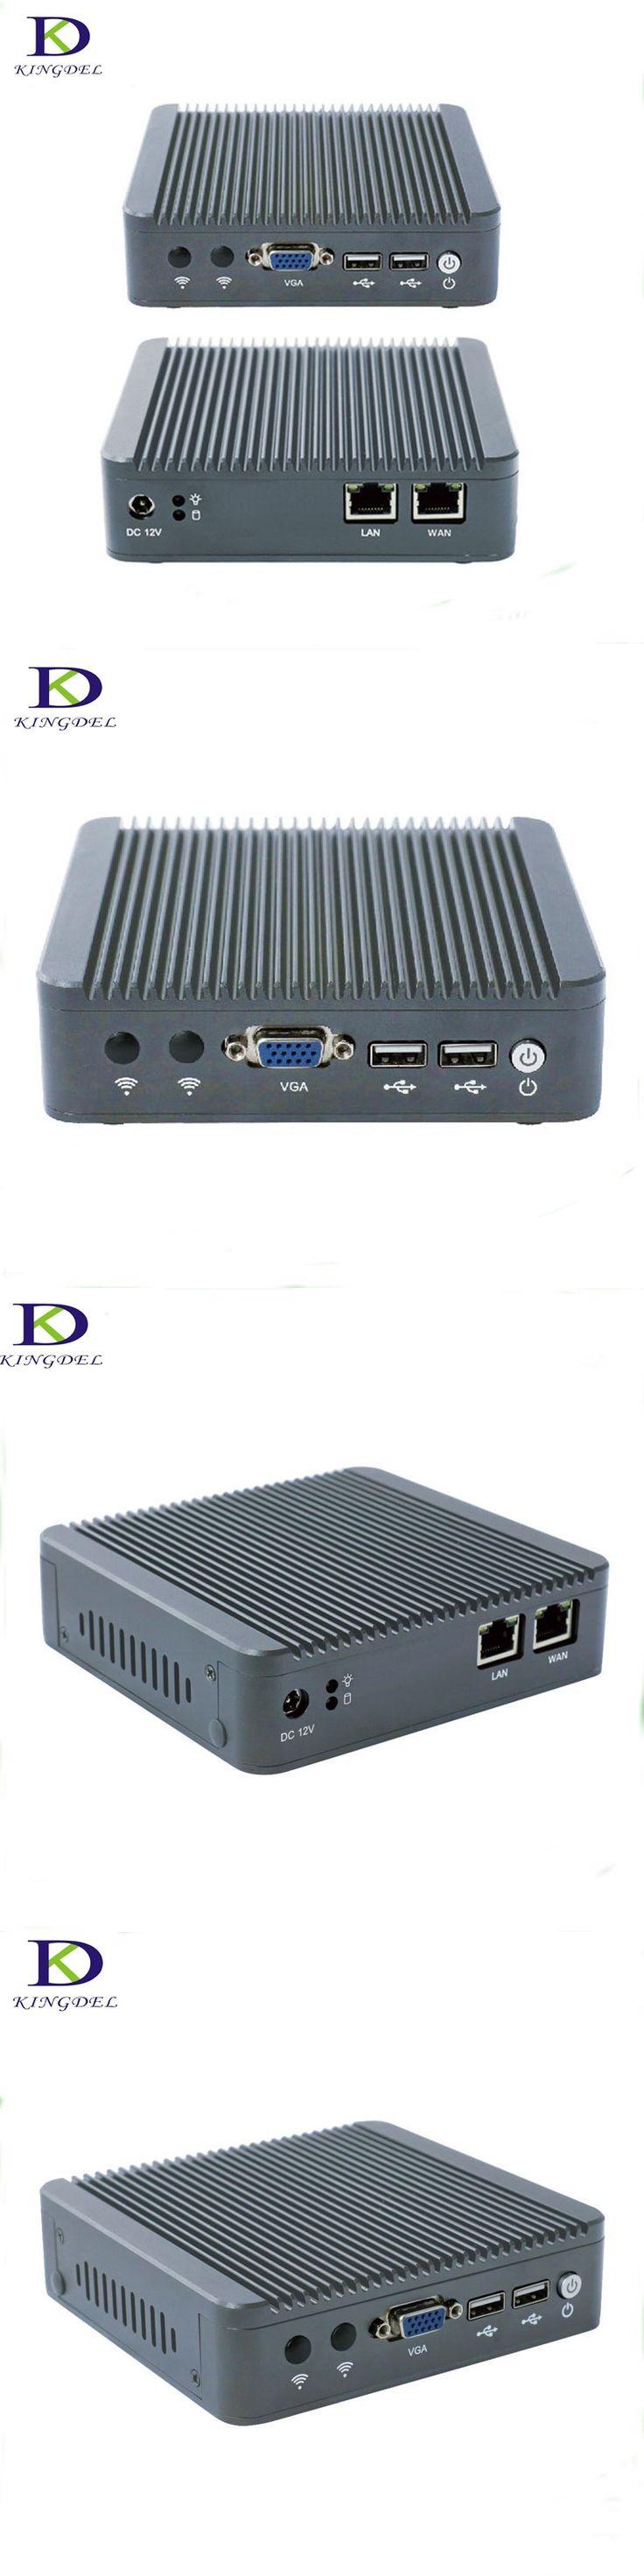 Small Fanless PC Qual-Core Celeron J1800 1* HDMI,1*VAG, Micro Computer 8G RAM Wifi Intel  2.41 GHz Mini PC 2*USB 2.0 ,2*LAN